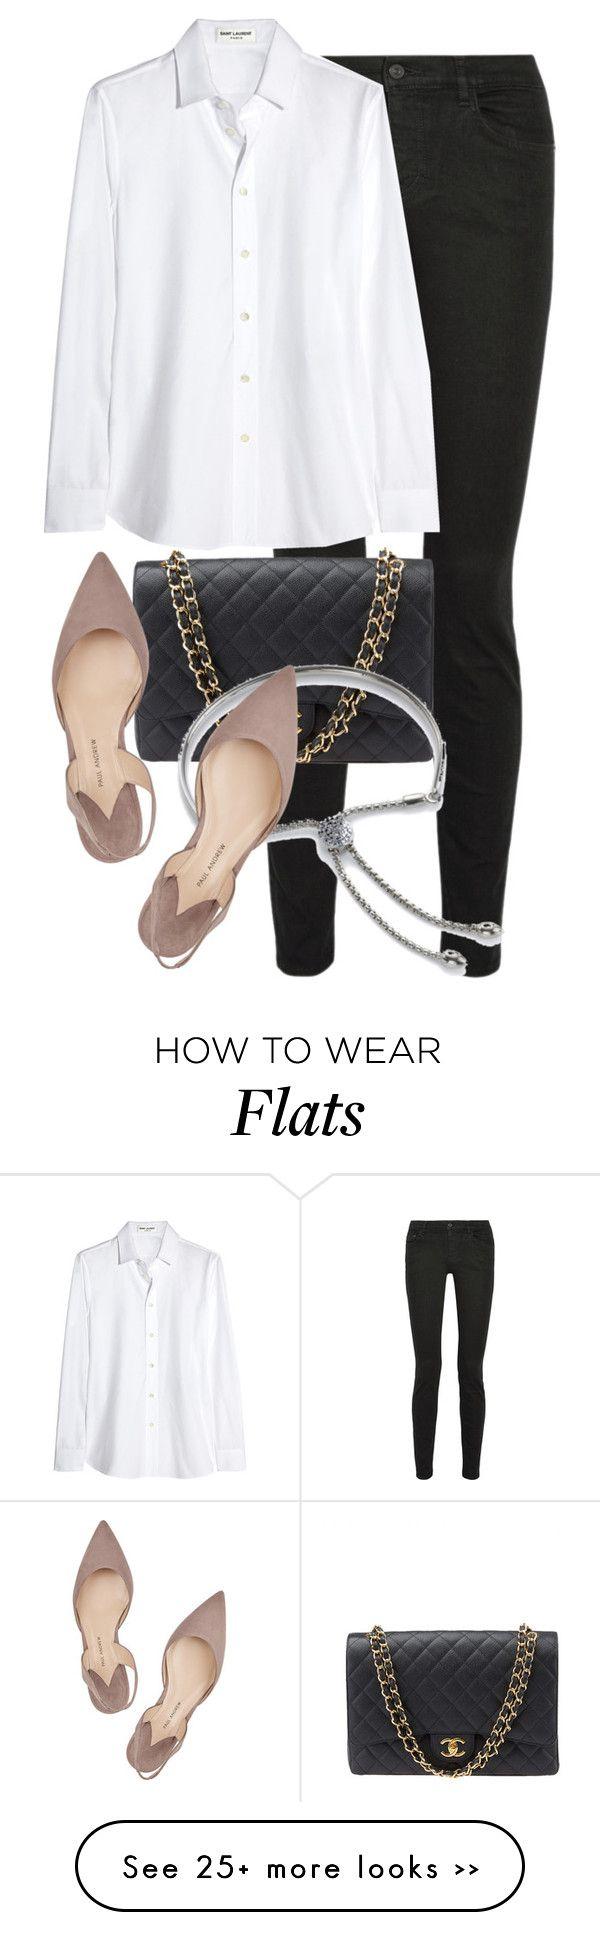 """Yves Saint Laurent x Chanel"" by xxxxxxxx1111 on Polyvore"